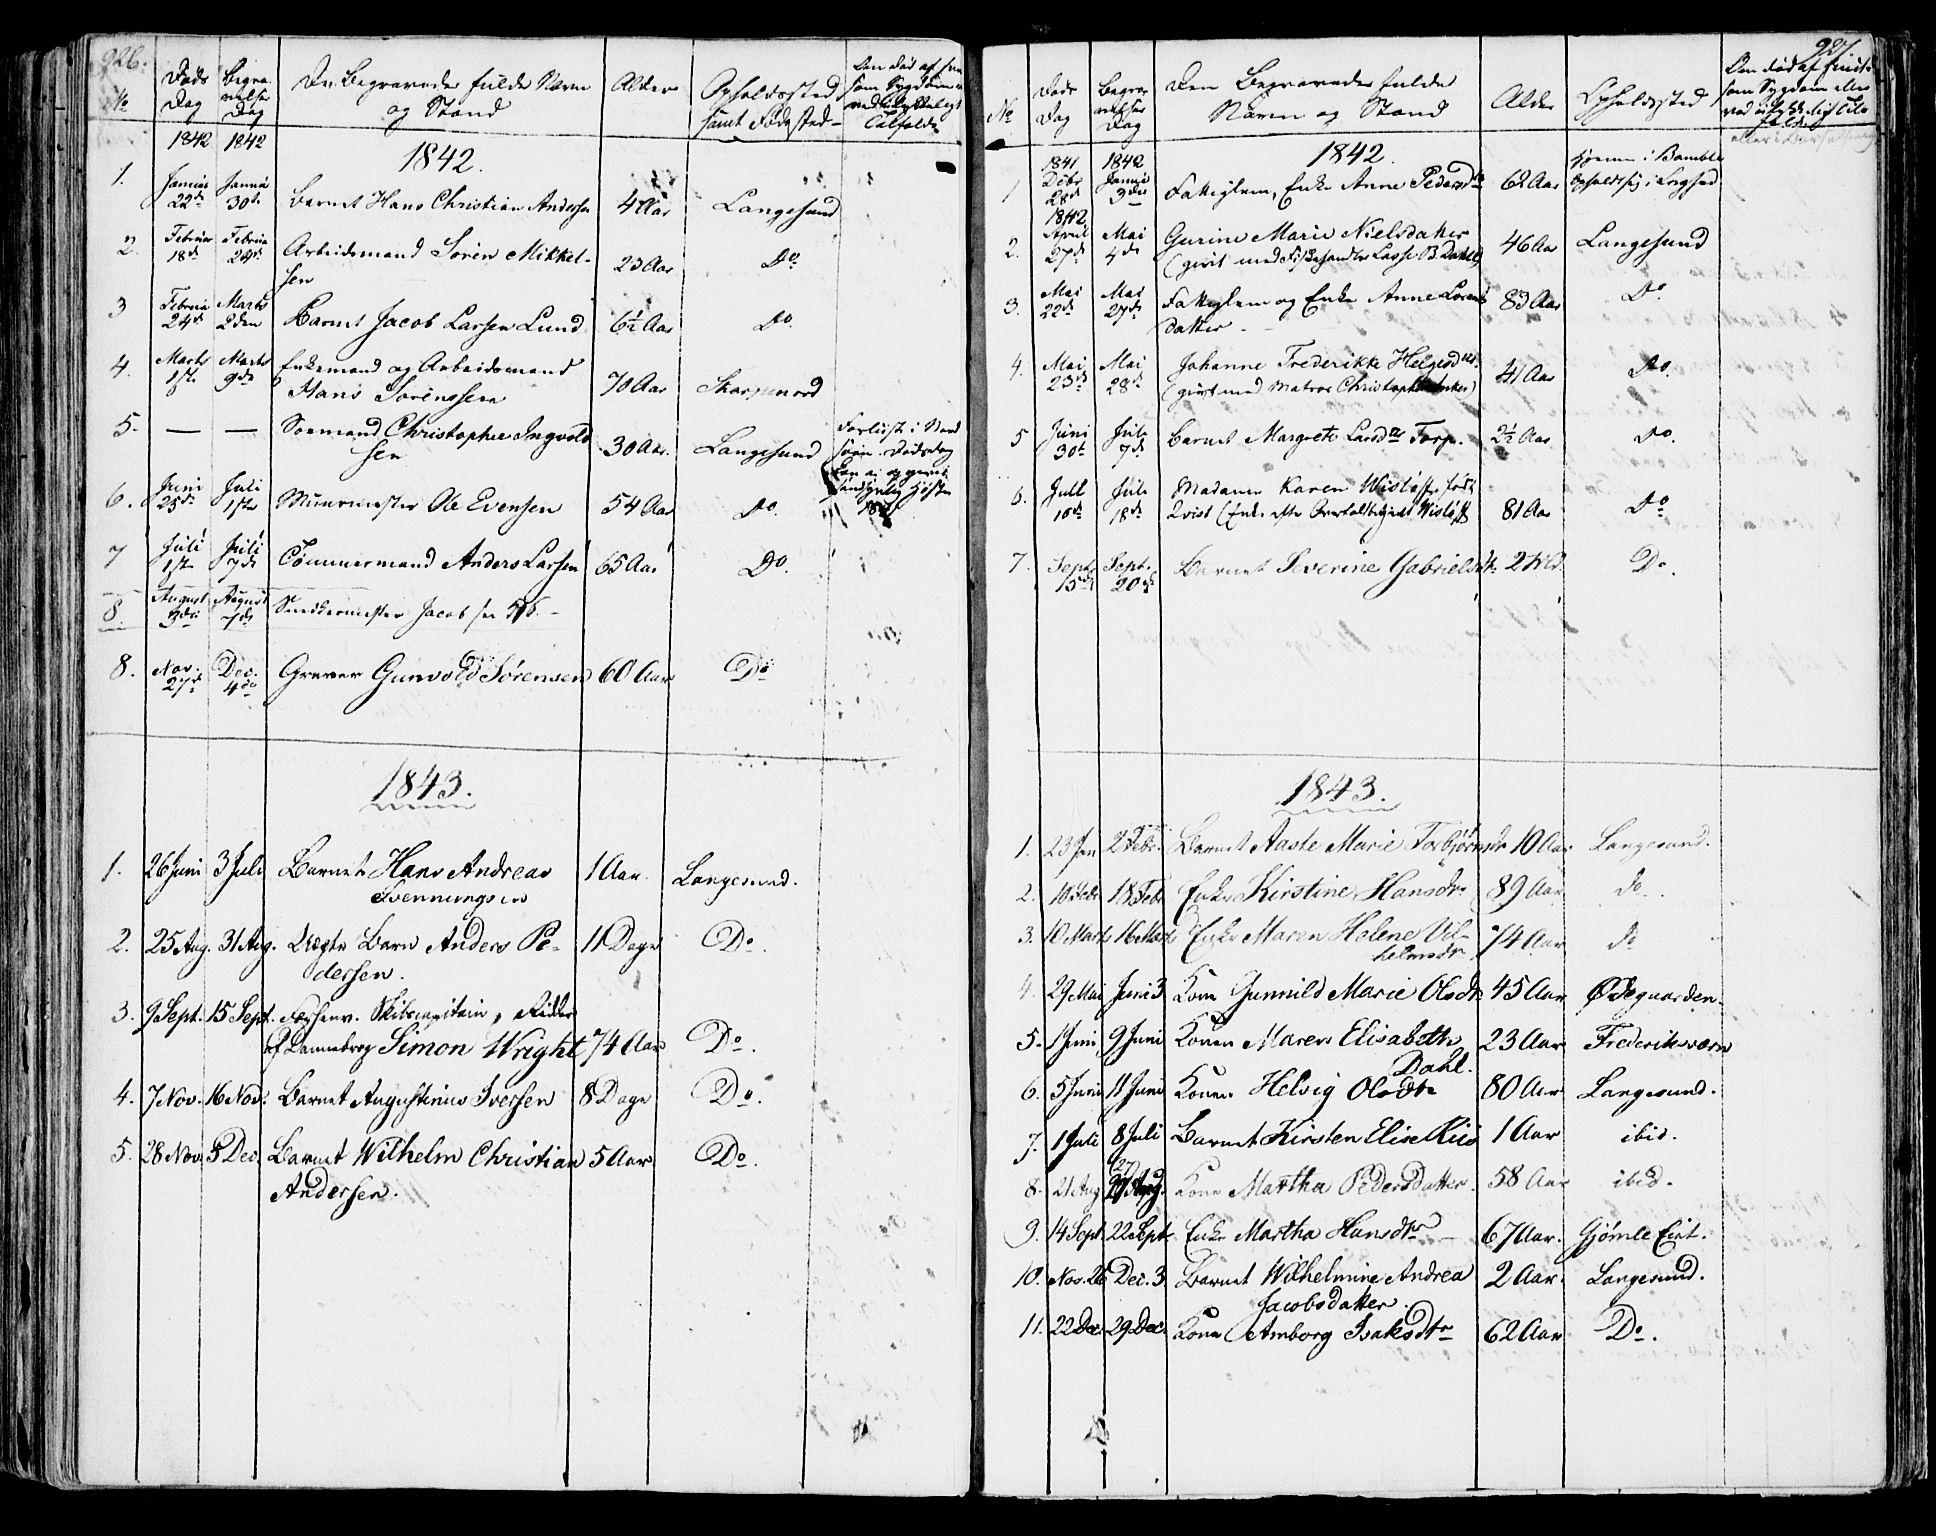 SAKO, Bamble kirkebøker, F/Fa/L0004: Ministerialbok nr. I 4, 1834-1853, s. 926-927